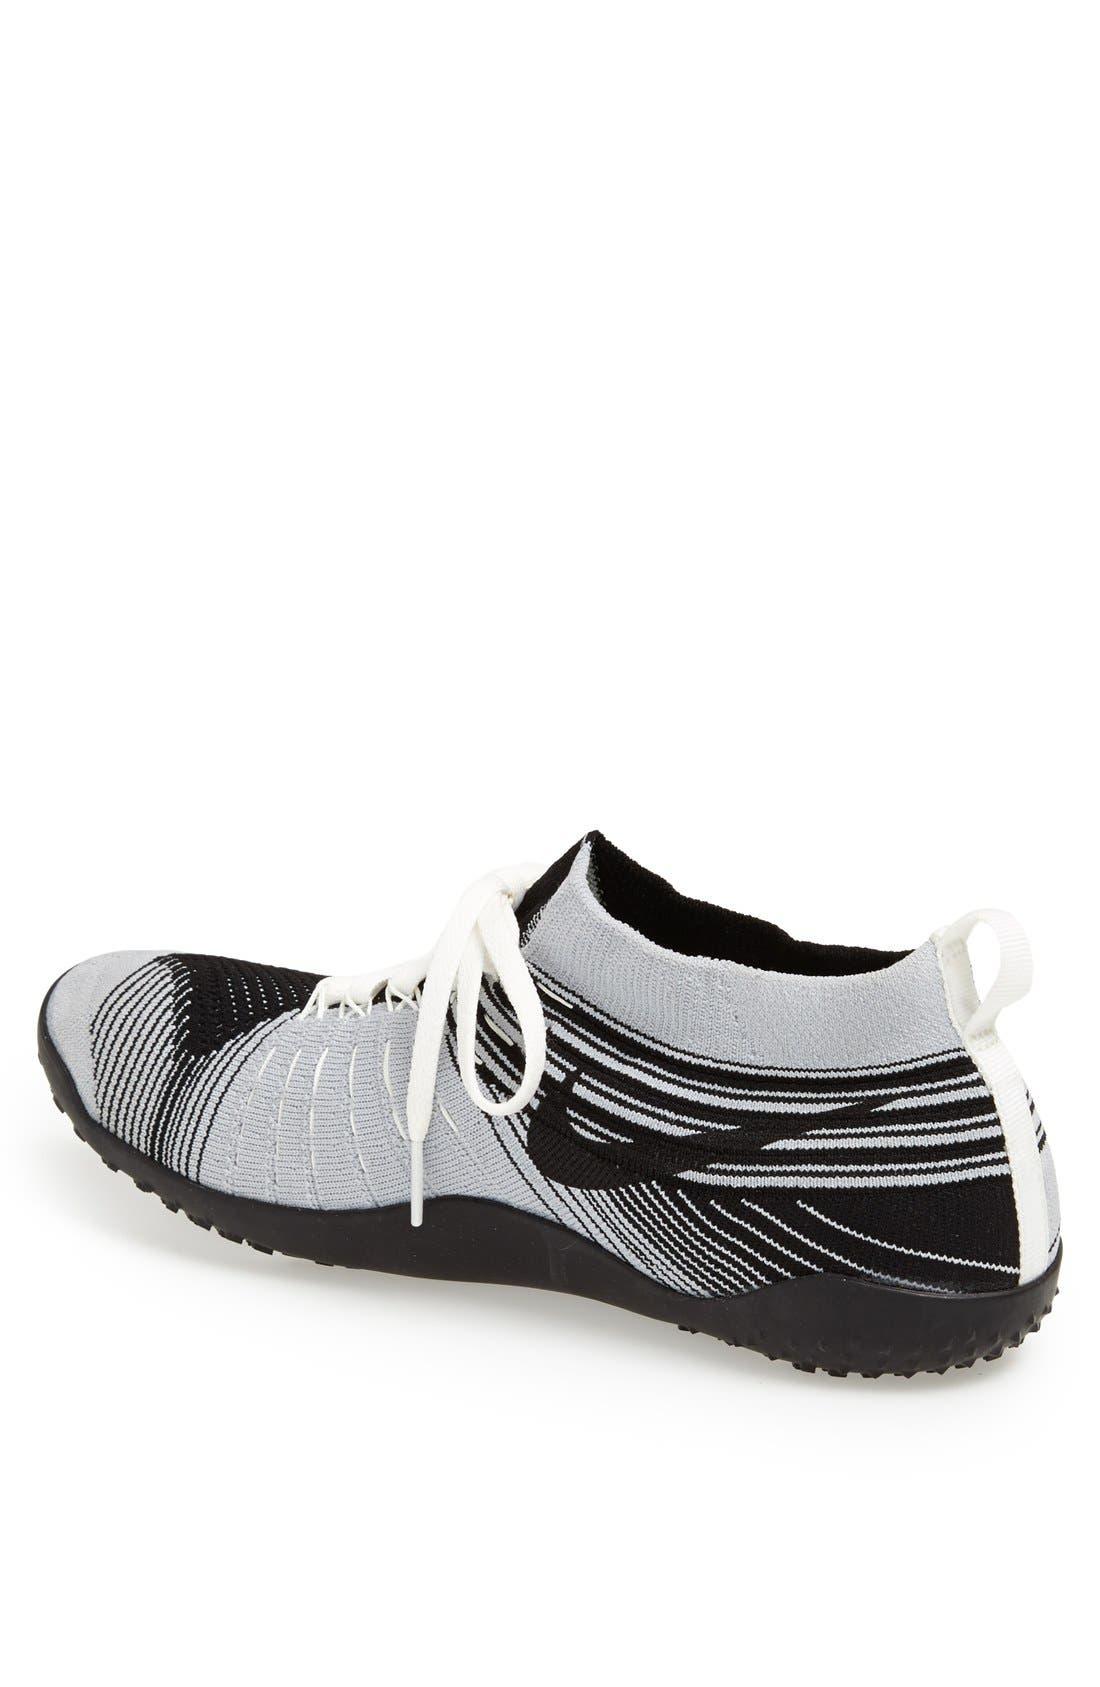 'Free Hyperfeel TR' Training Shoe,                             Alternate thumbnail 4, color,                             001